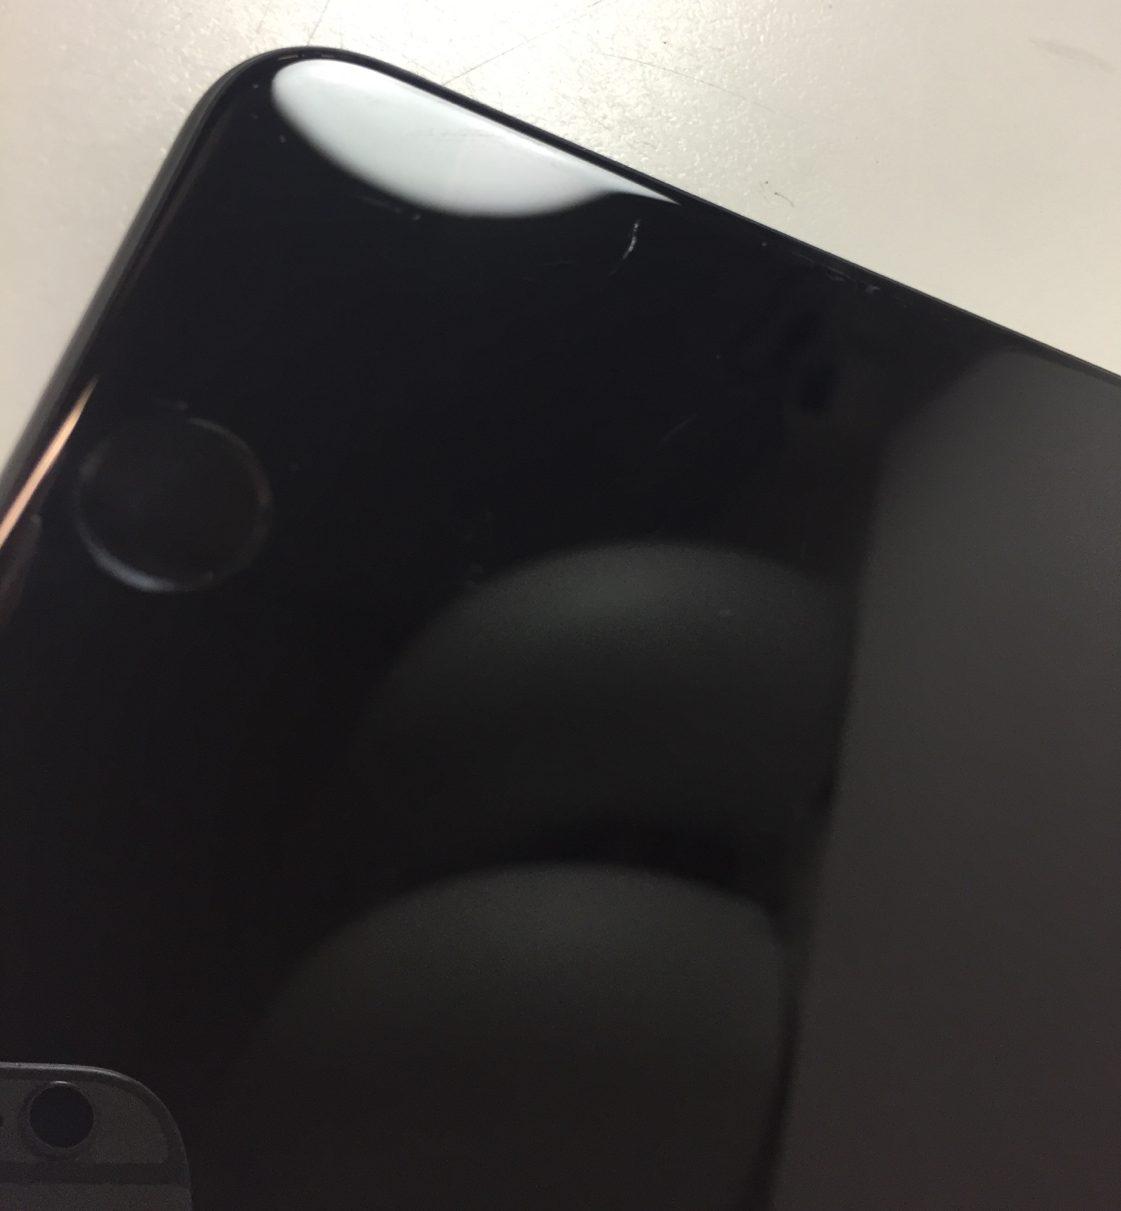 iPhone 8 Plus 64GB, 64GB, Space Gray, Afbeelding 3